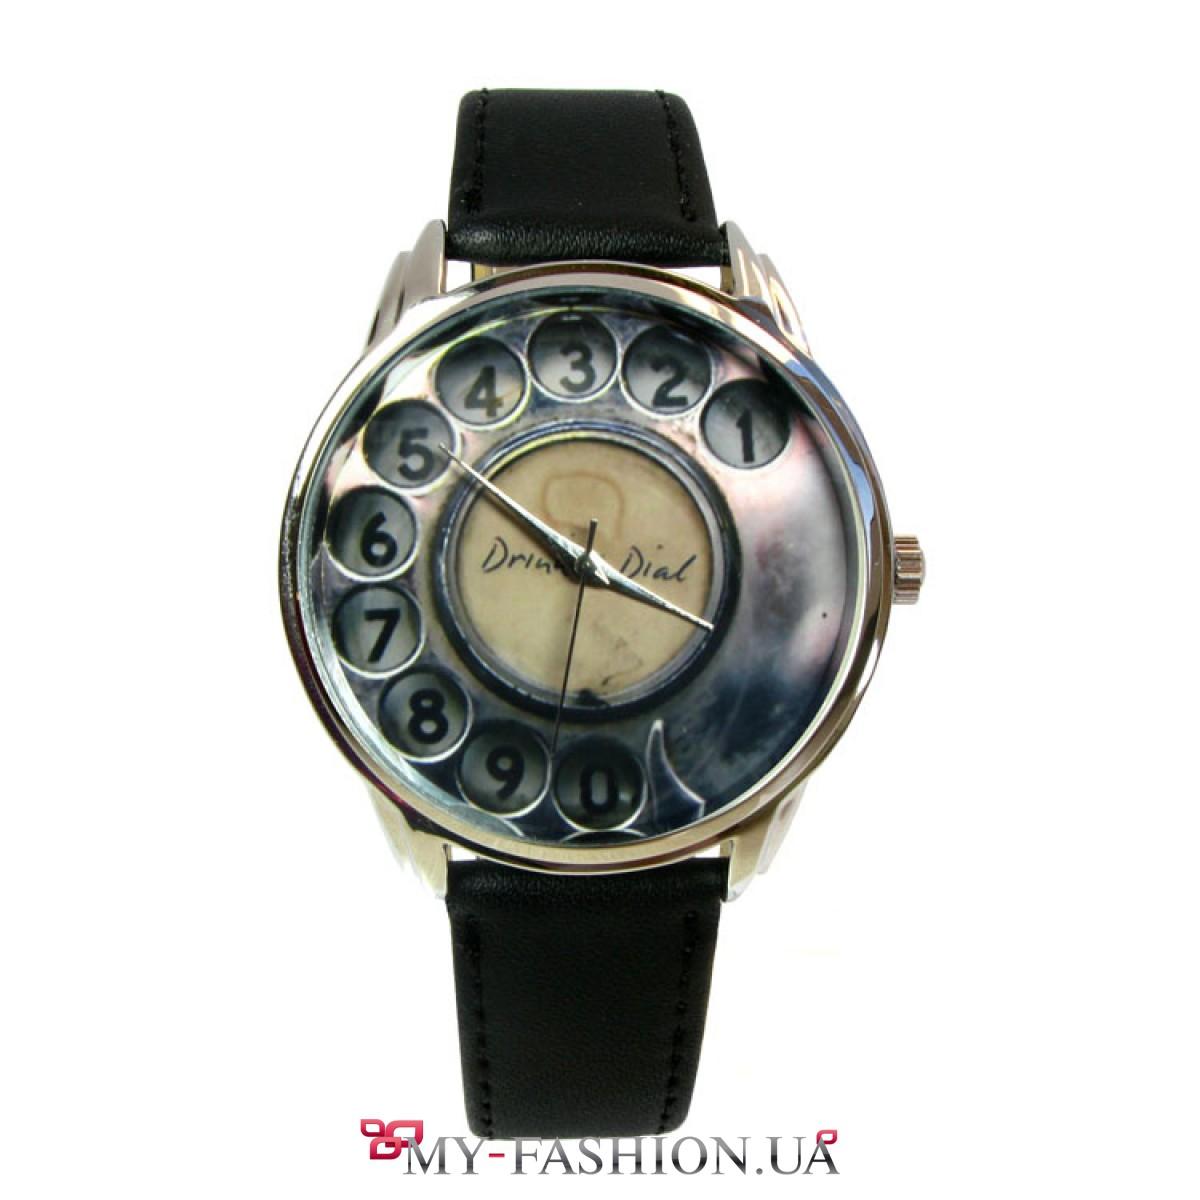 Наручные часы диск репликанты наручных часов